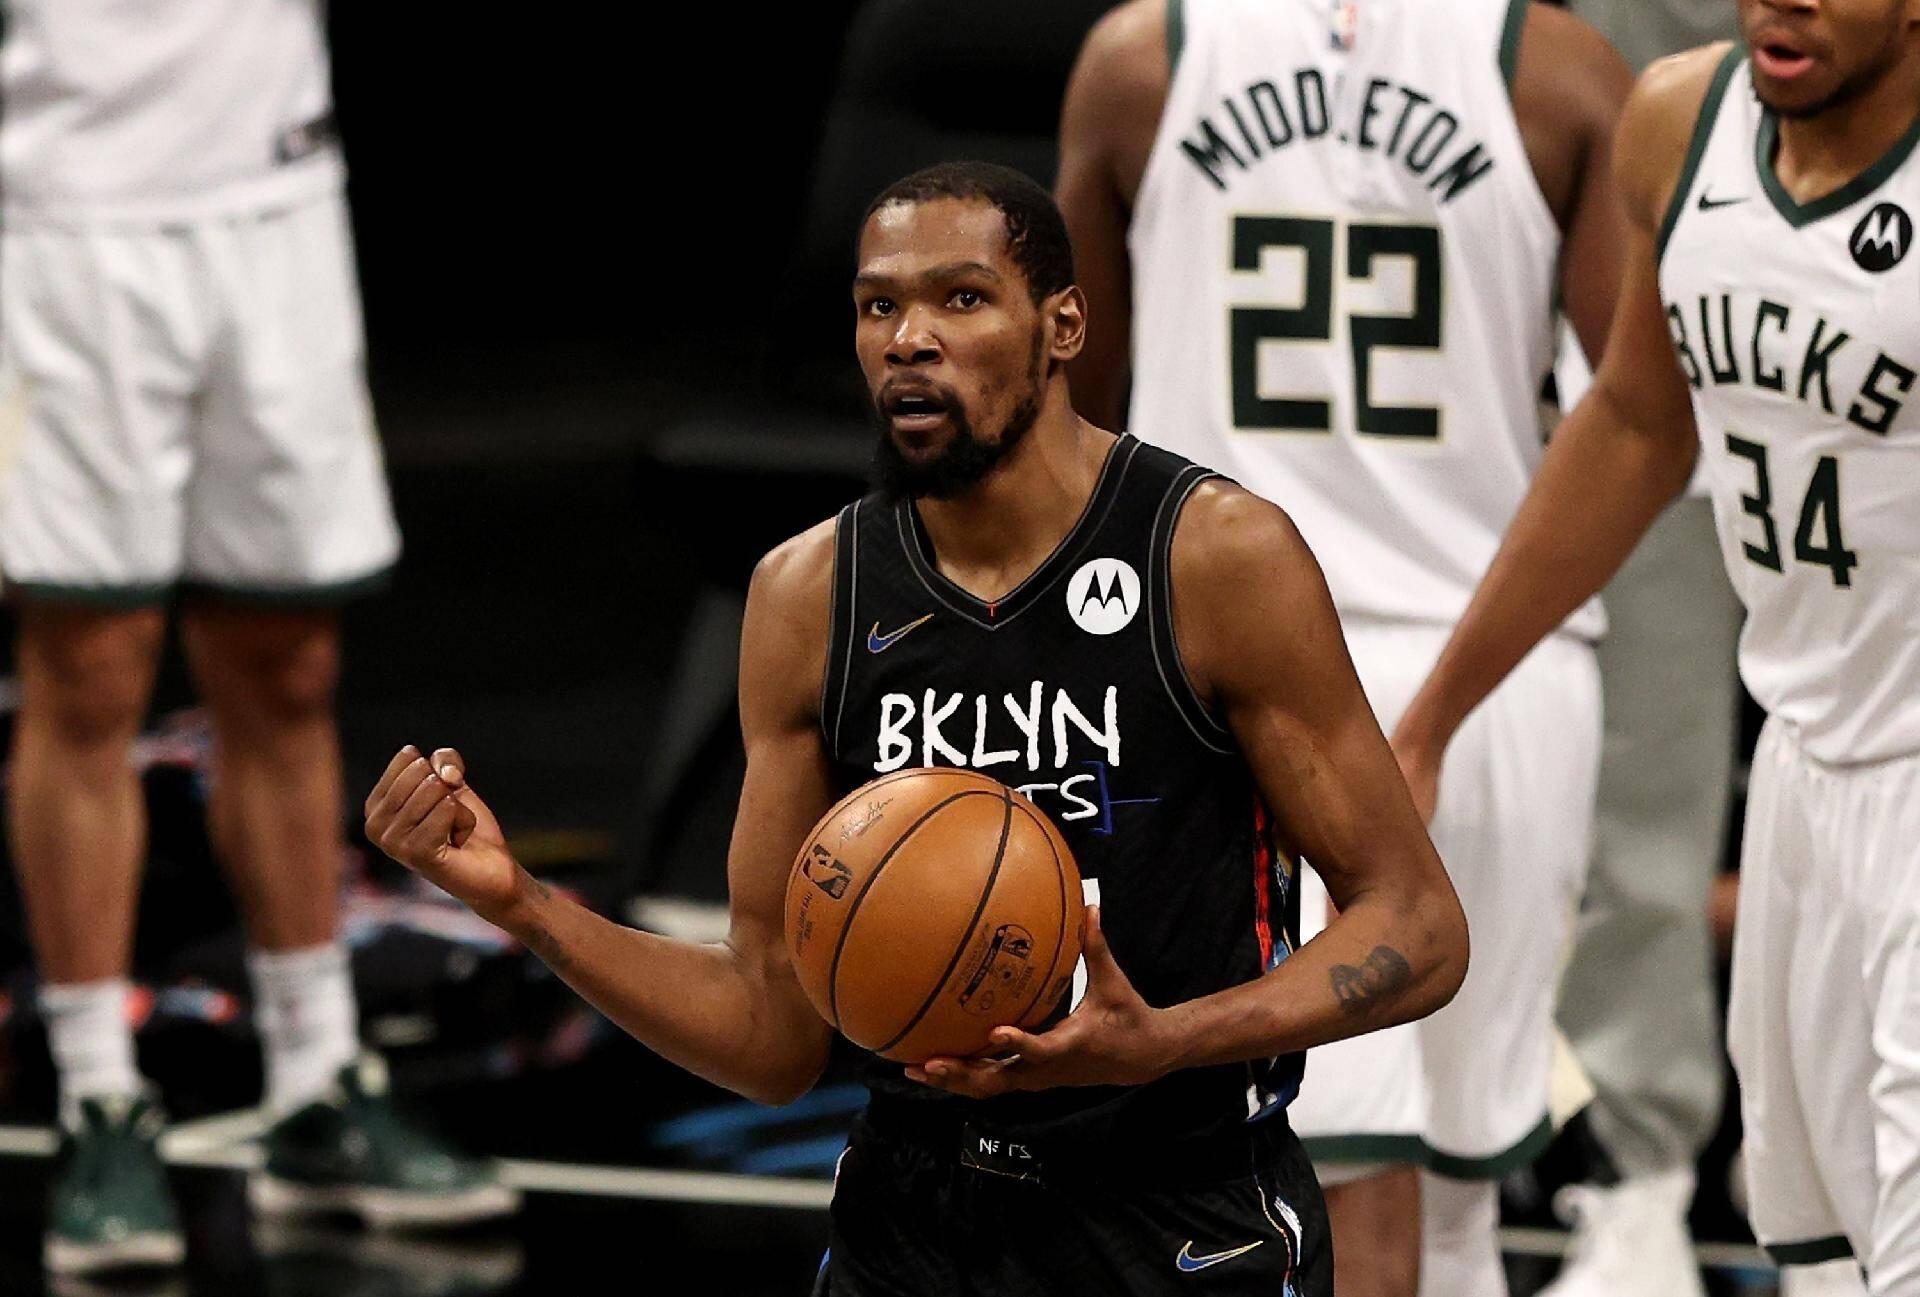 4 - Kevin Durant (Brooklyn Nets/NBA). Foto: Divulgação